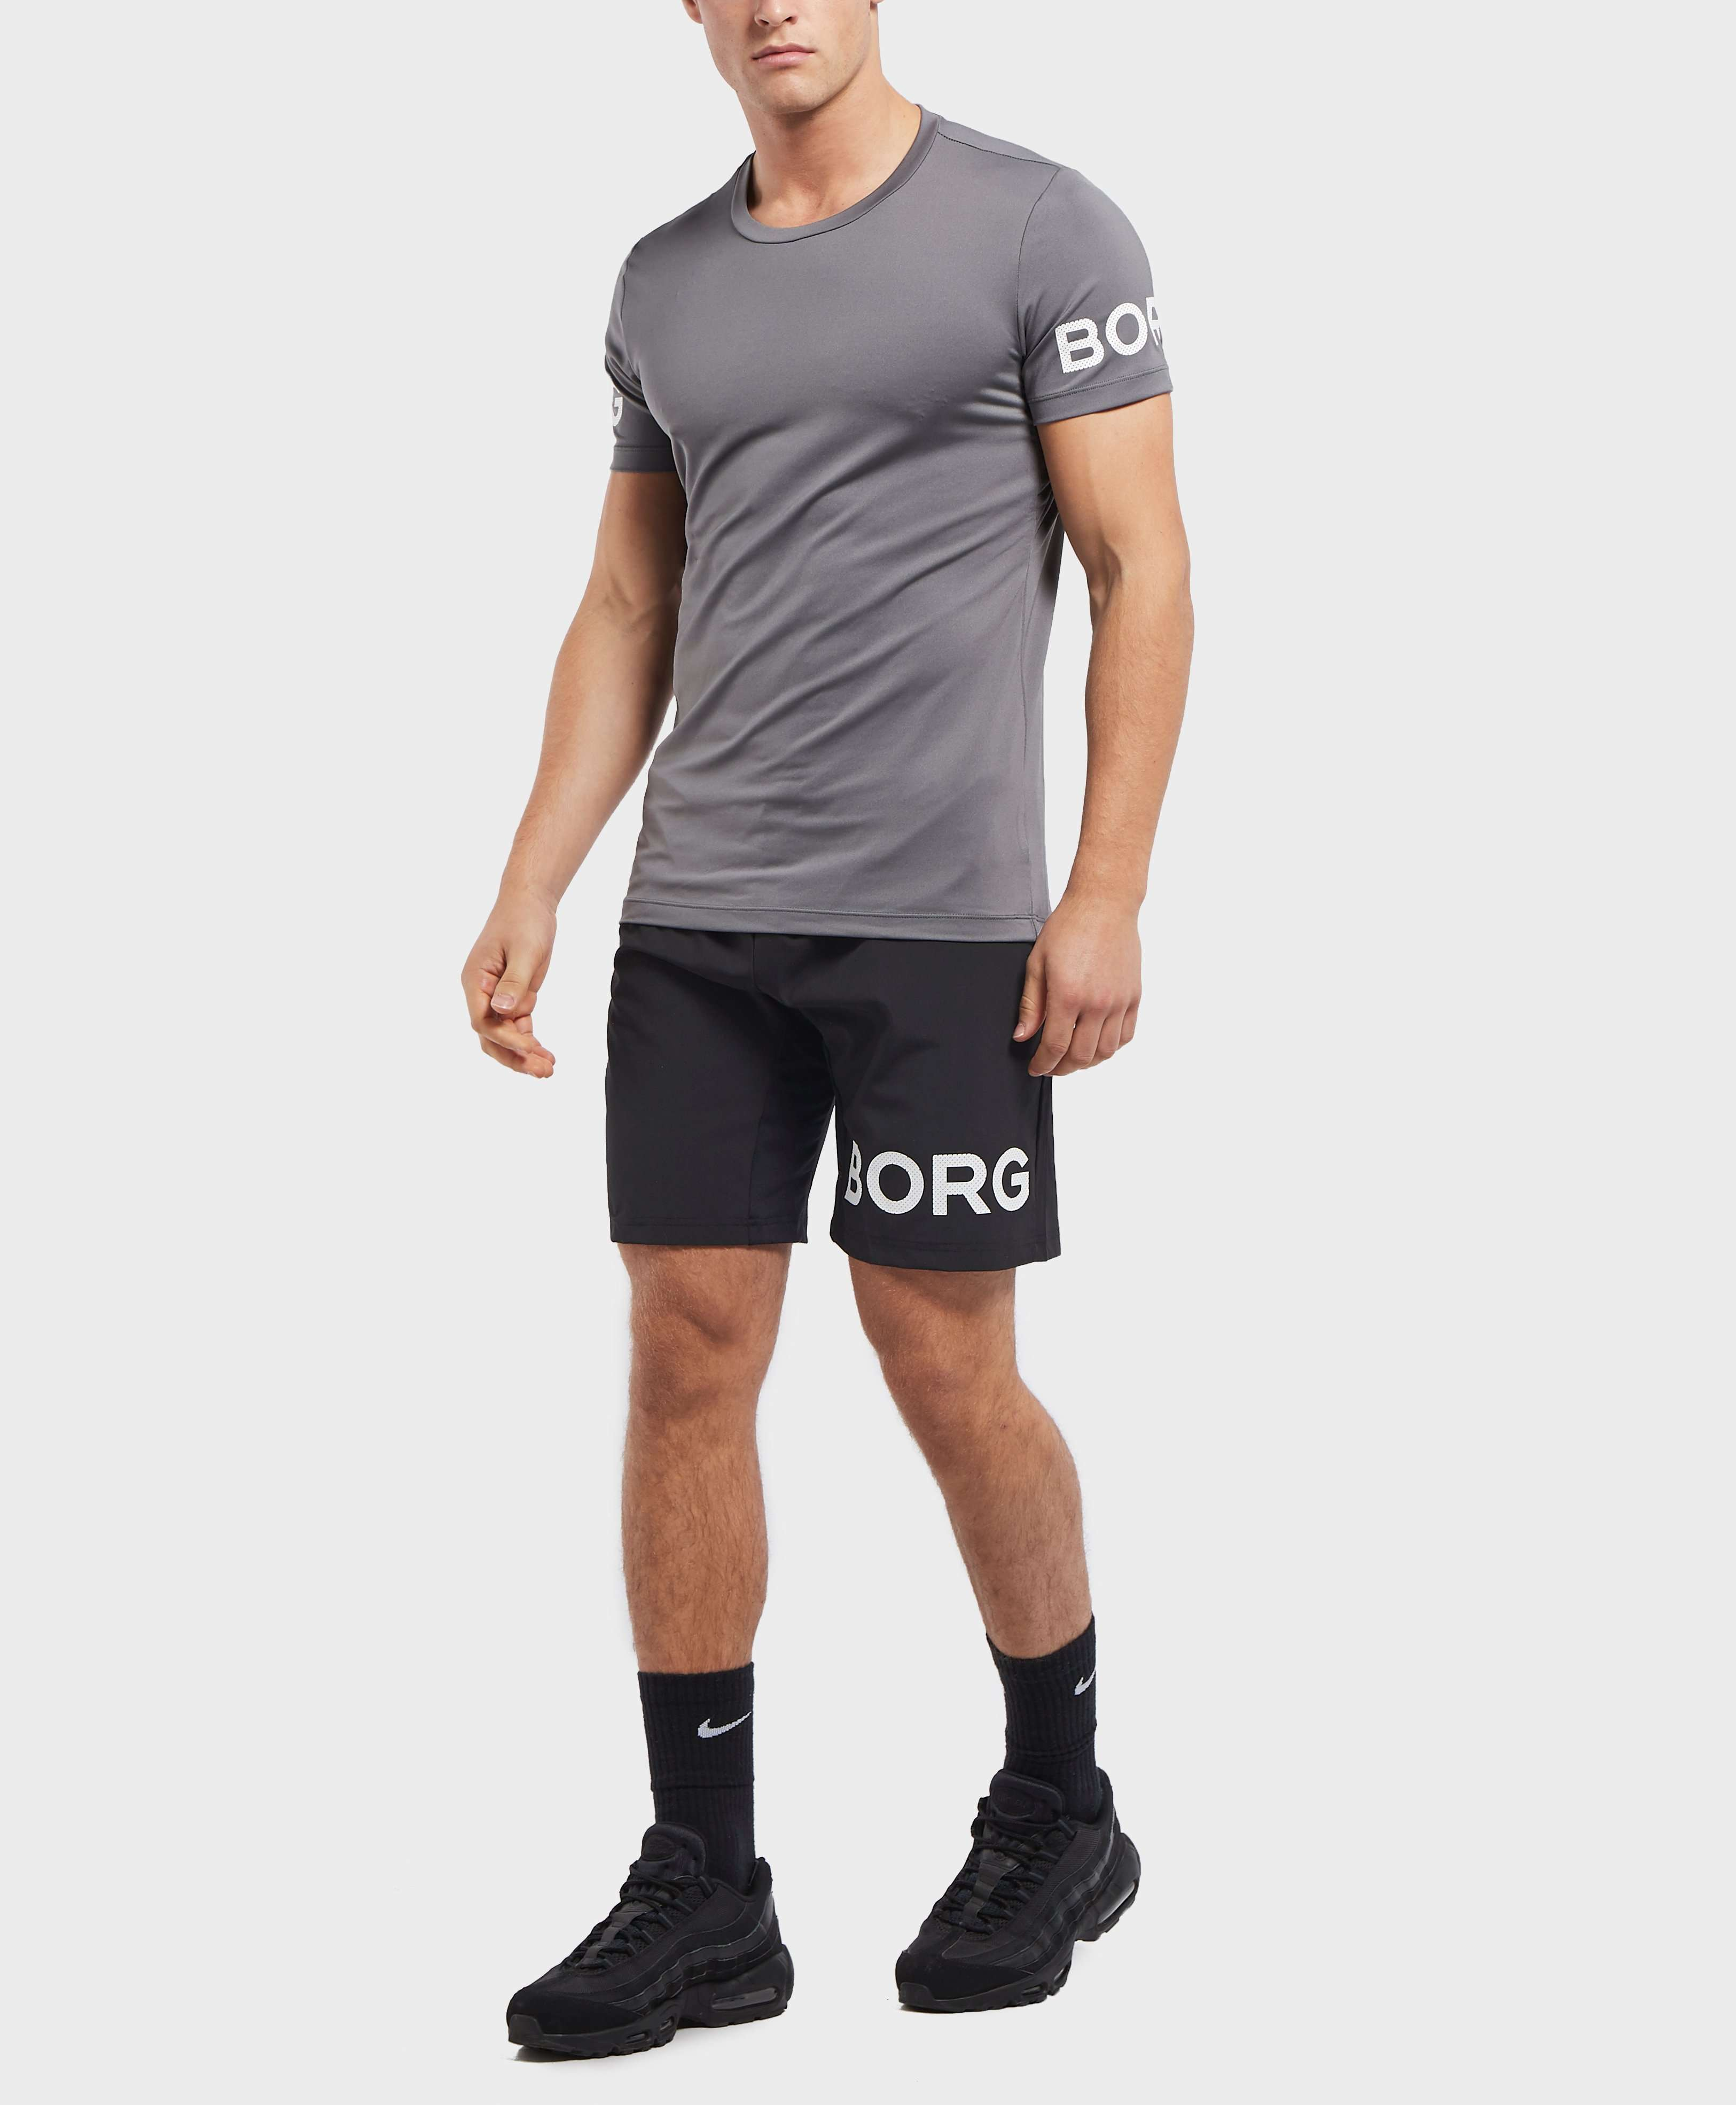 Bjorn Borg Short Sleeve T-Shirt